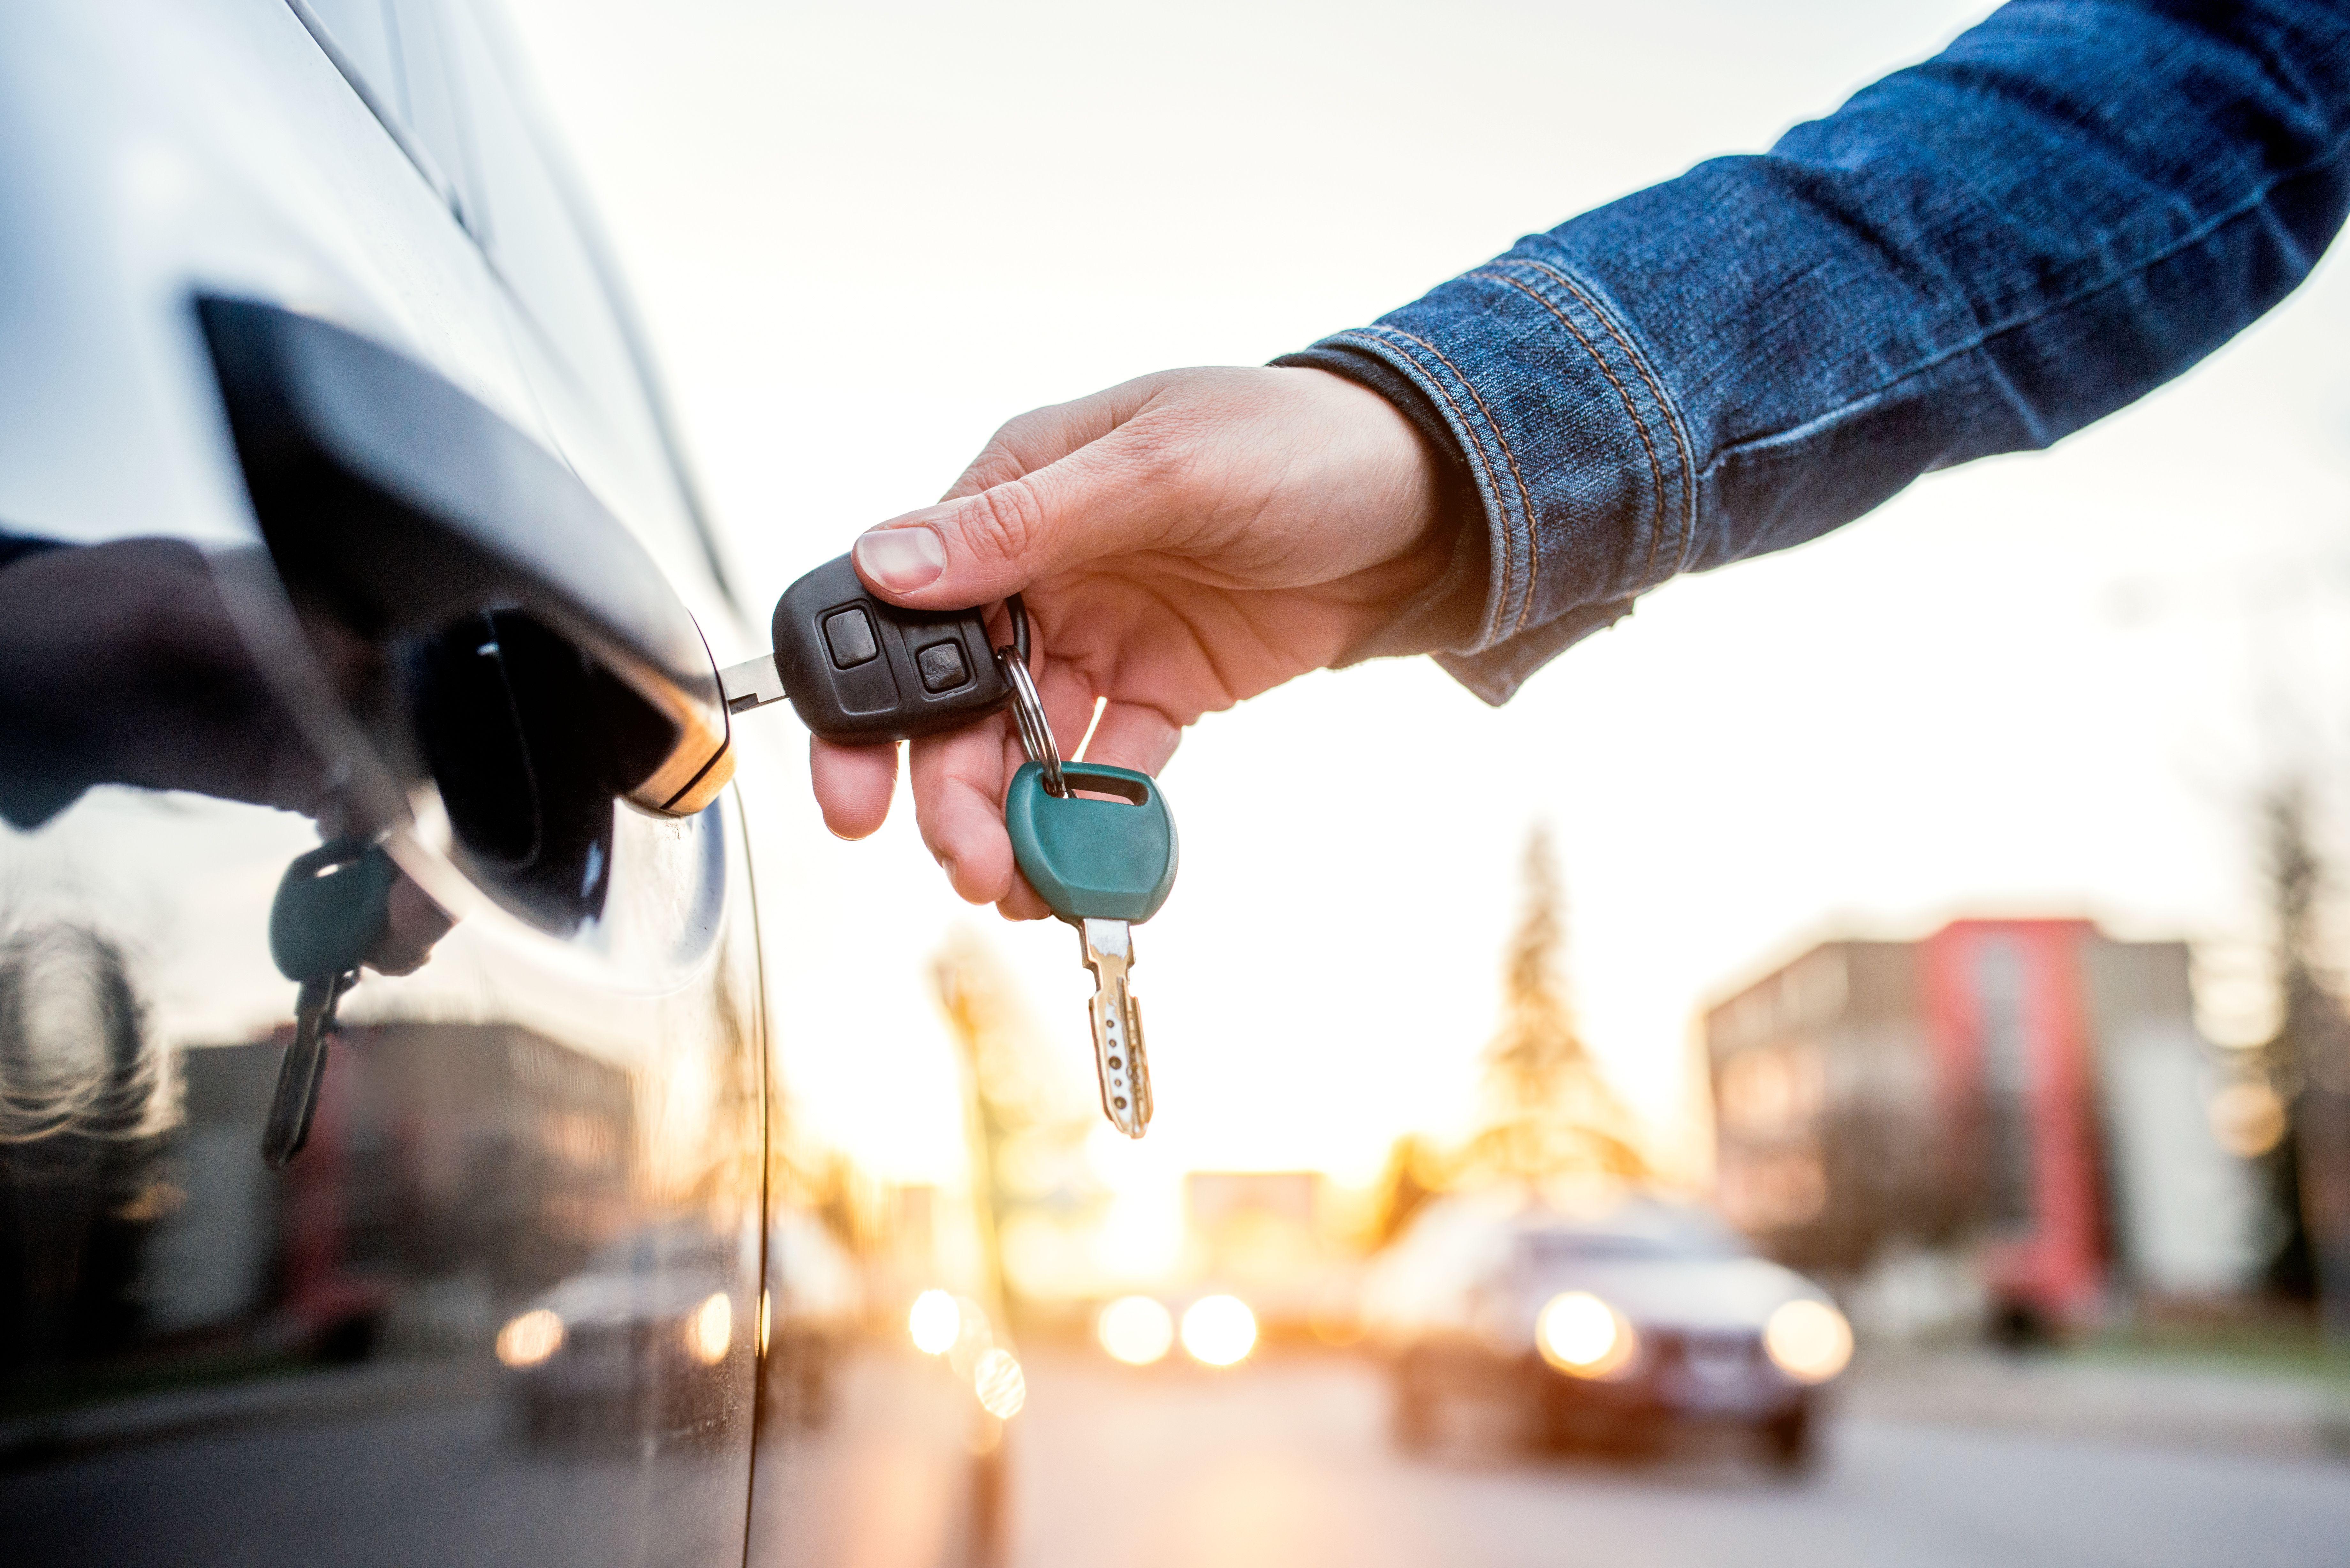 Apertura de coches en Logroño